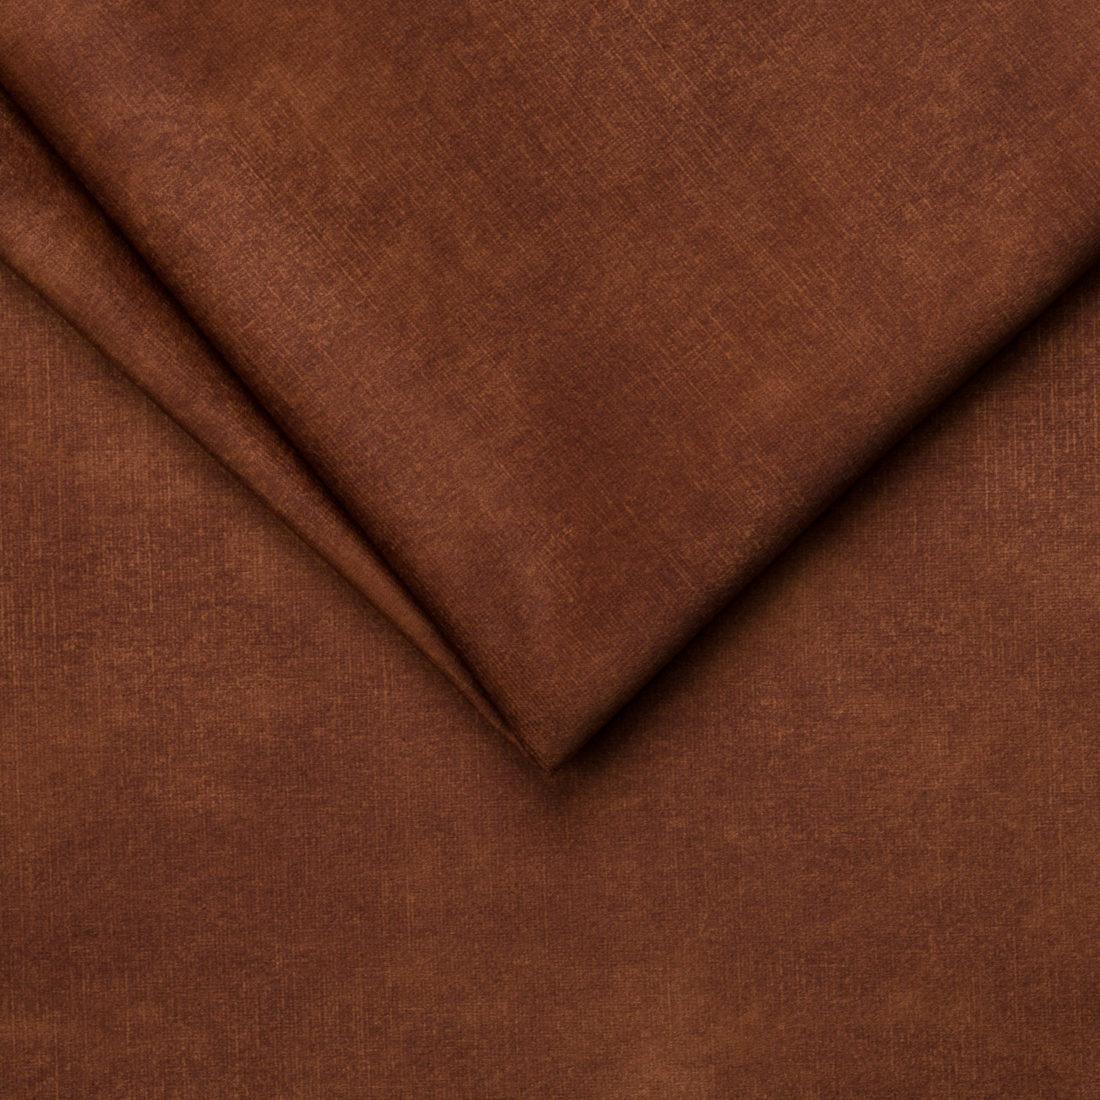 Мебельная ткань Palladium 8 Whisky, велюр